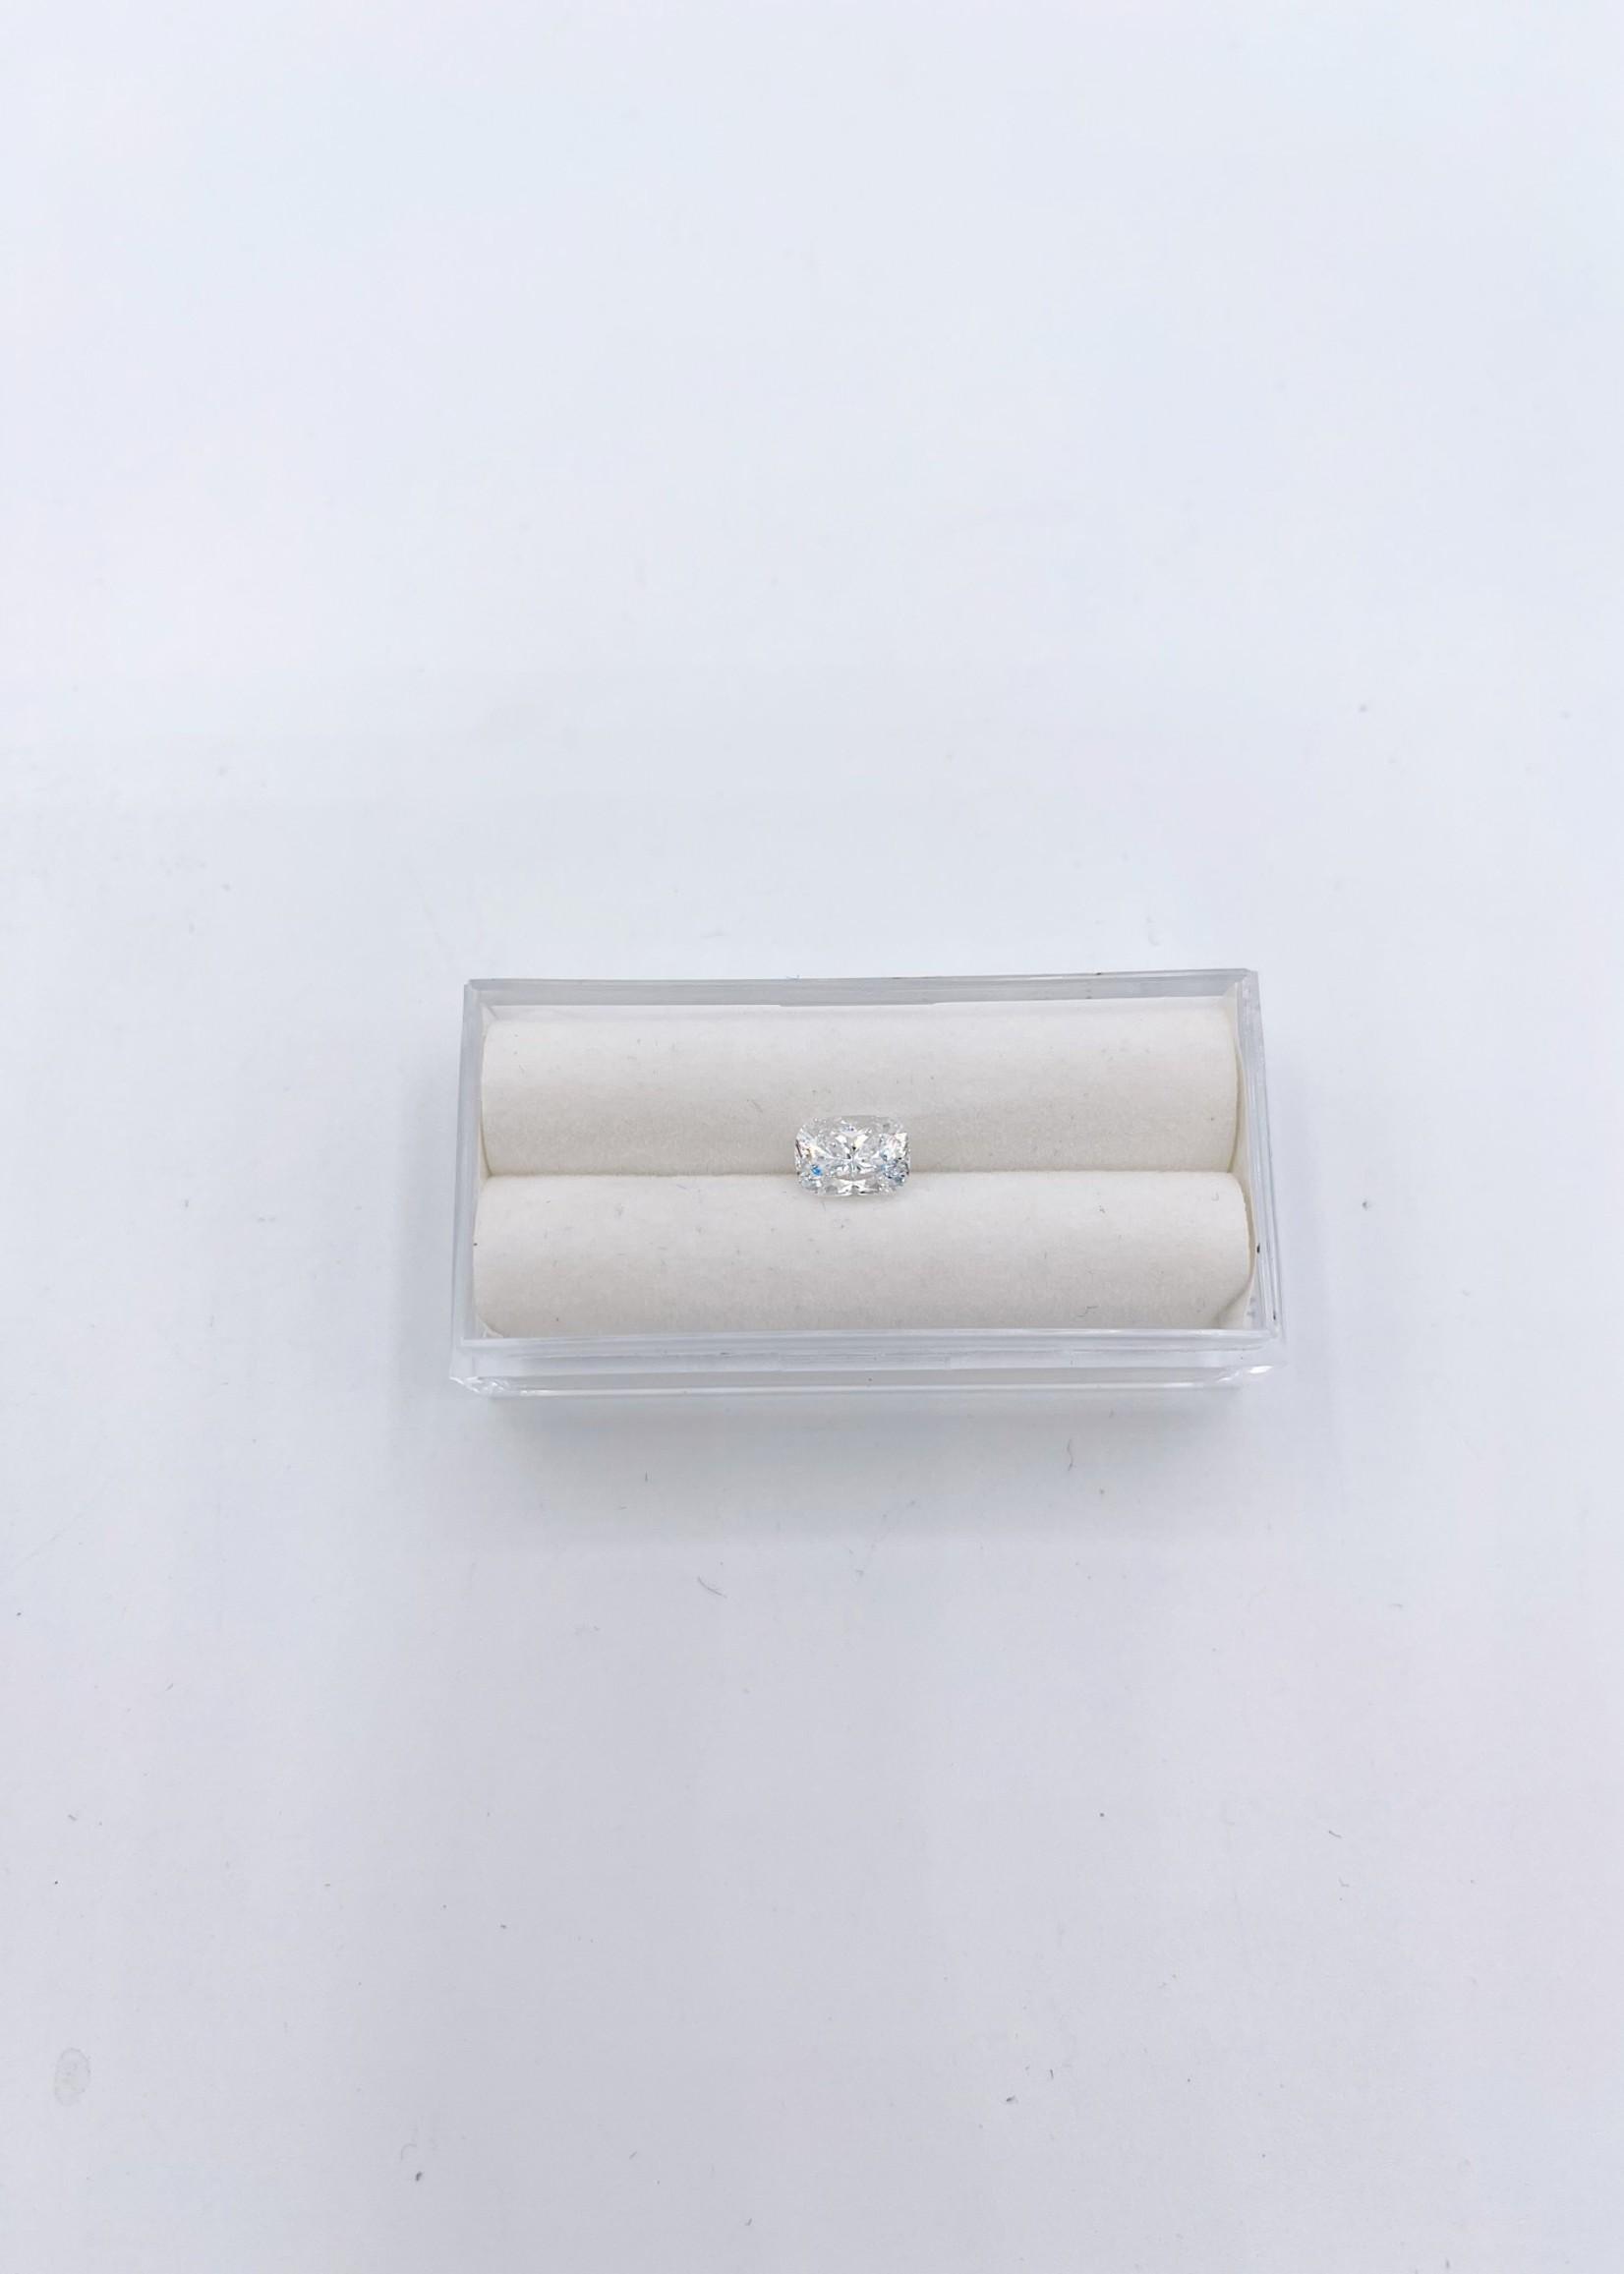 Lannyte Lannyte Cushion Cut 1.81ct 1.5/7x5mm  White